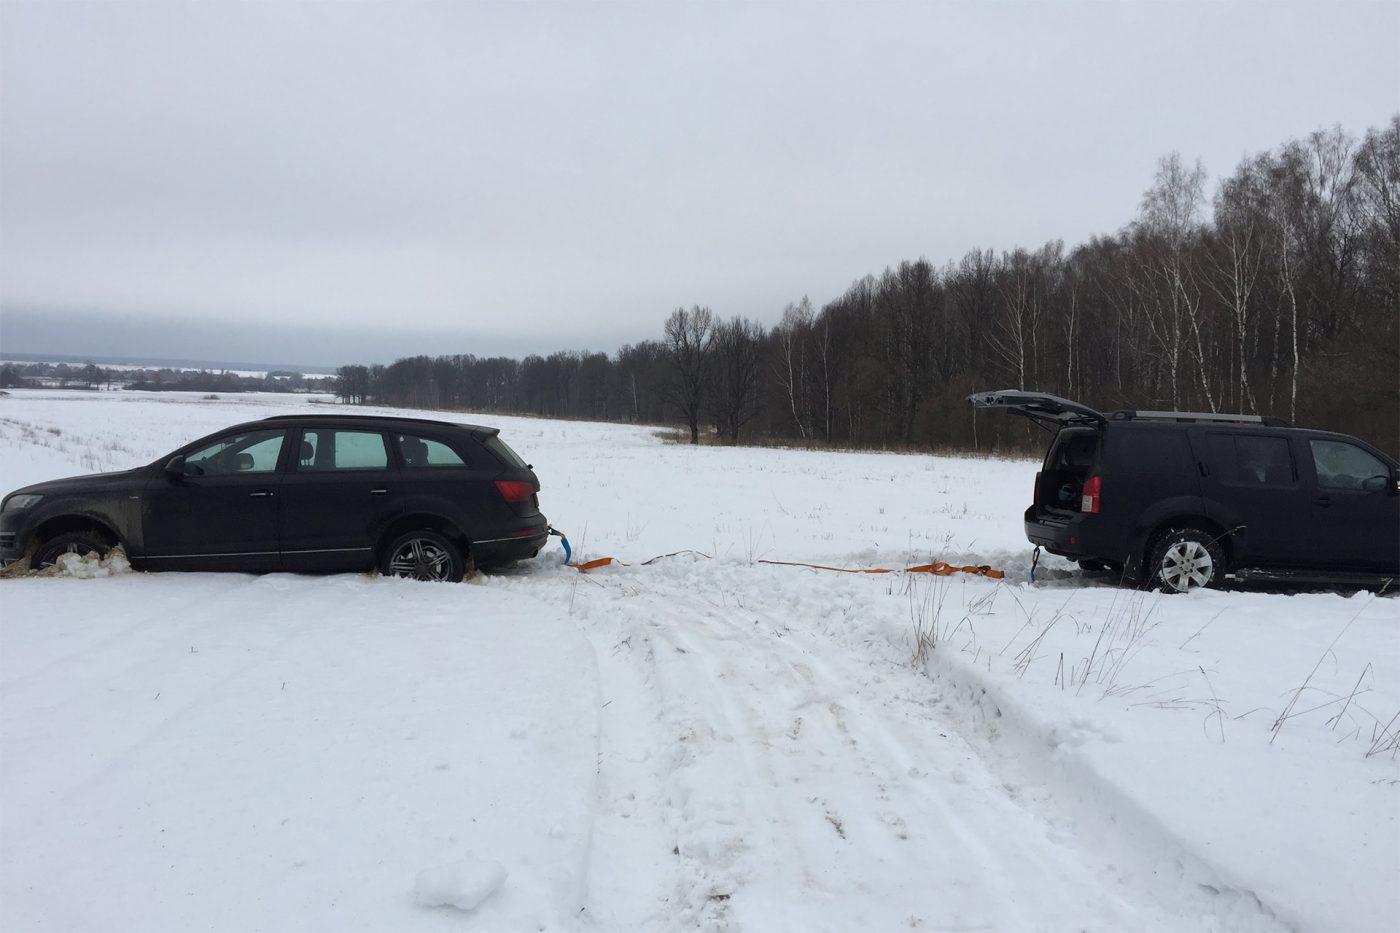 Audi stuck in snow